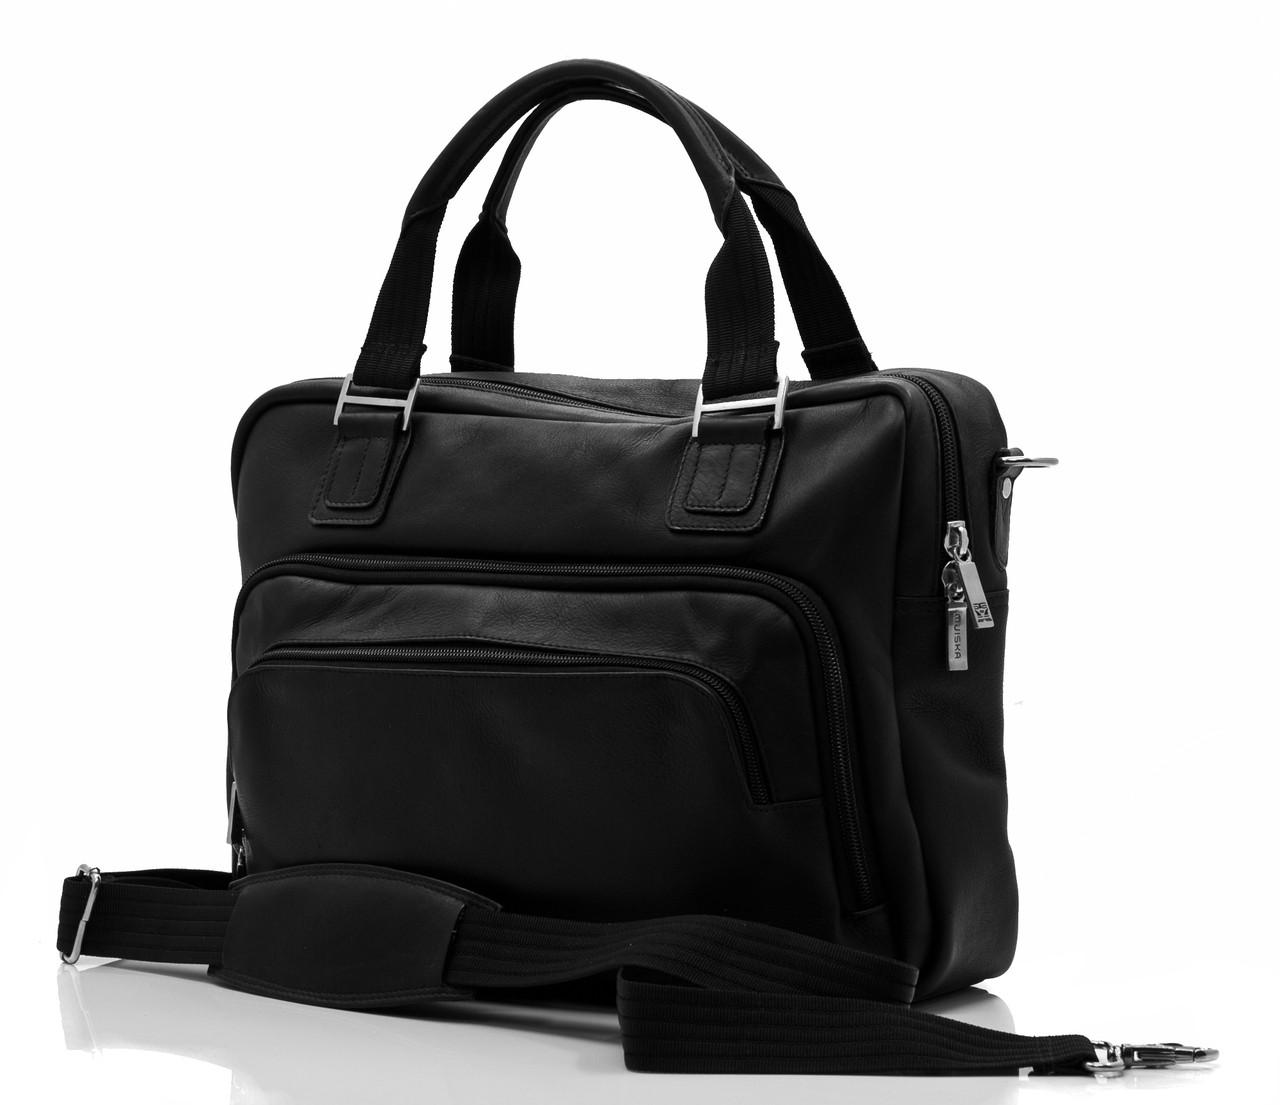 Muiska - Paris  - Multi-Purpose Leather Computer Briefcase - Front View, Black